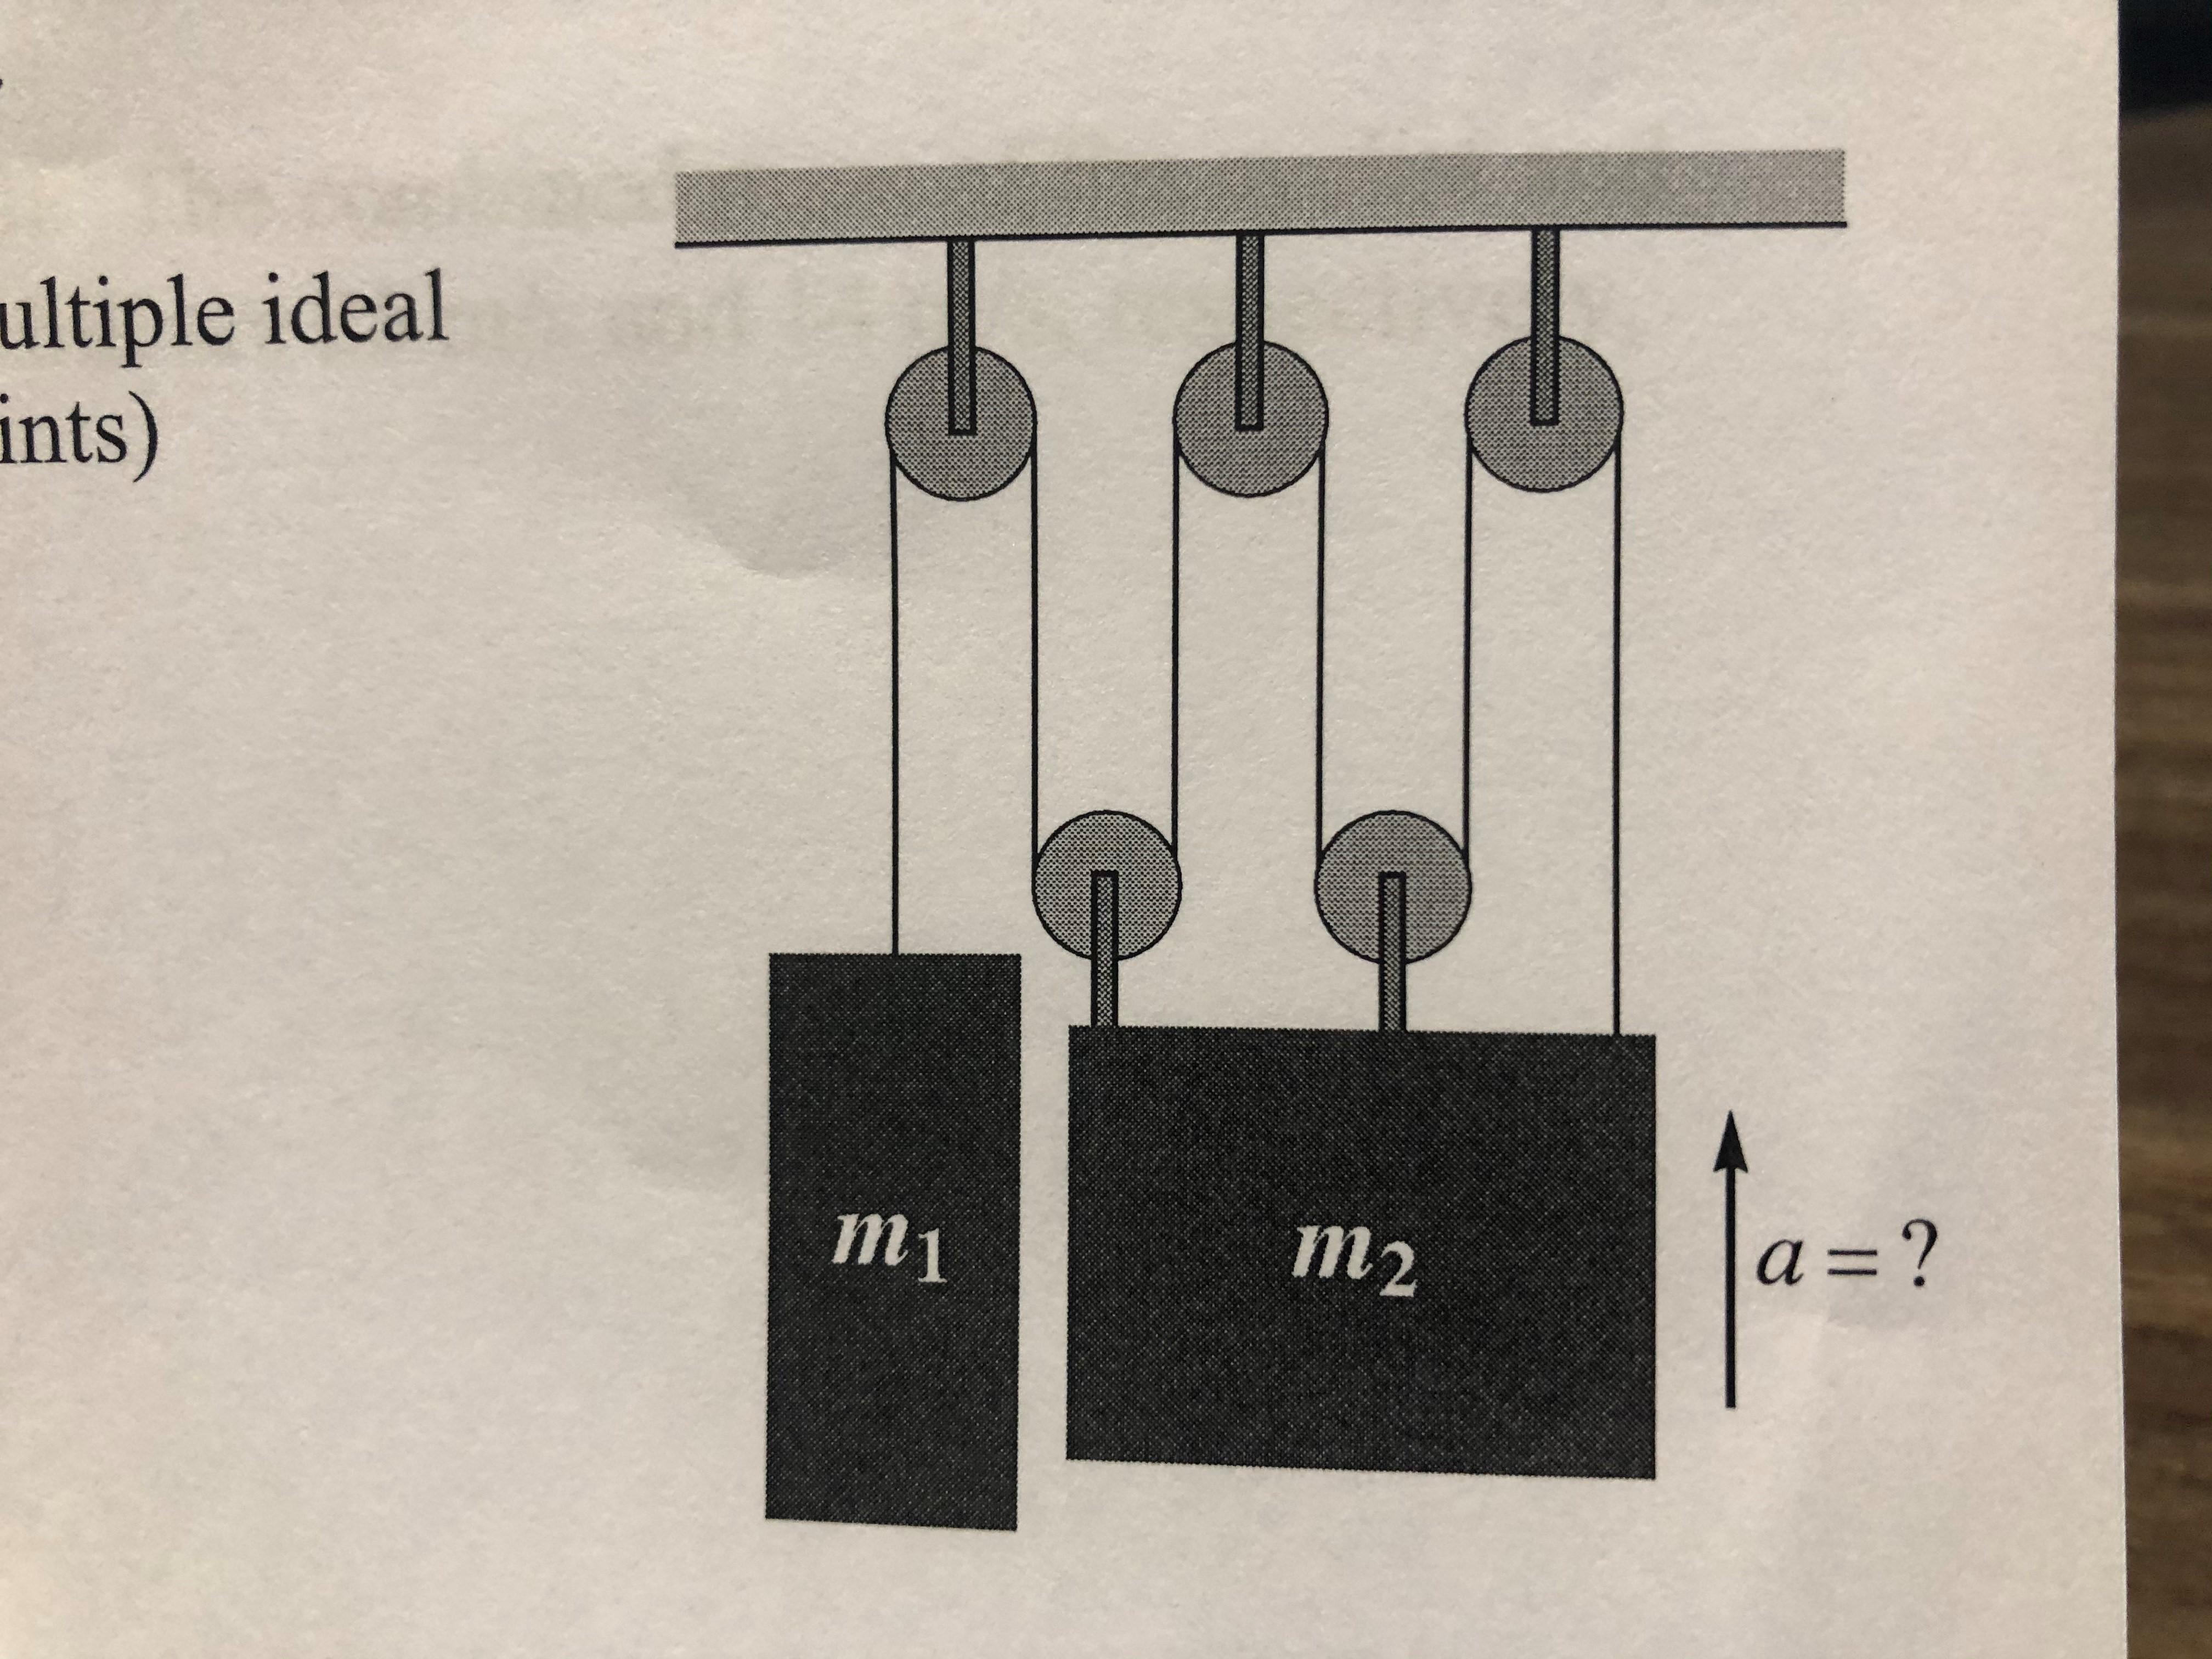 ultiple ideal ints) тi -? т2 a =